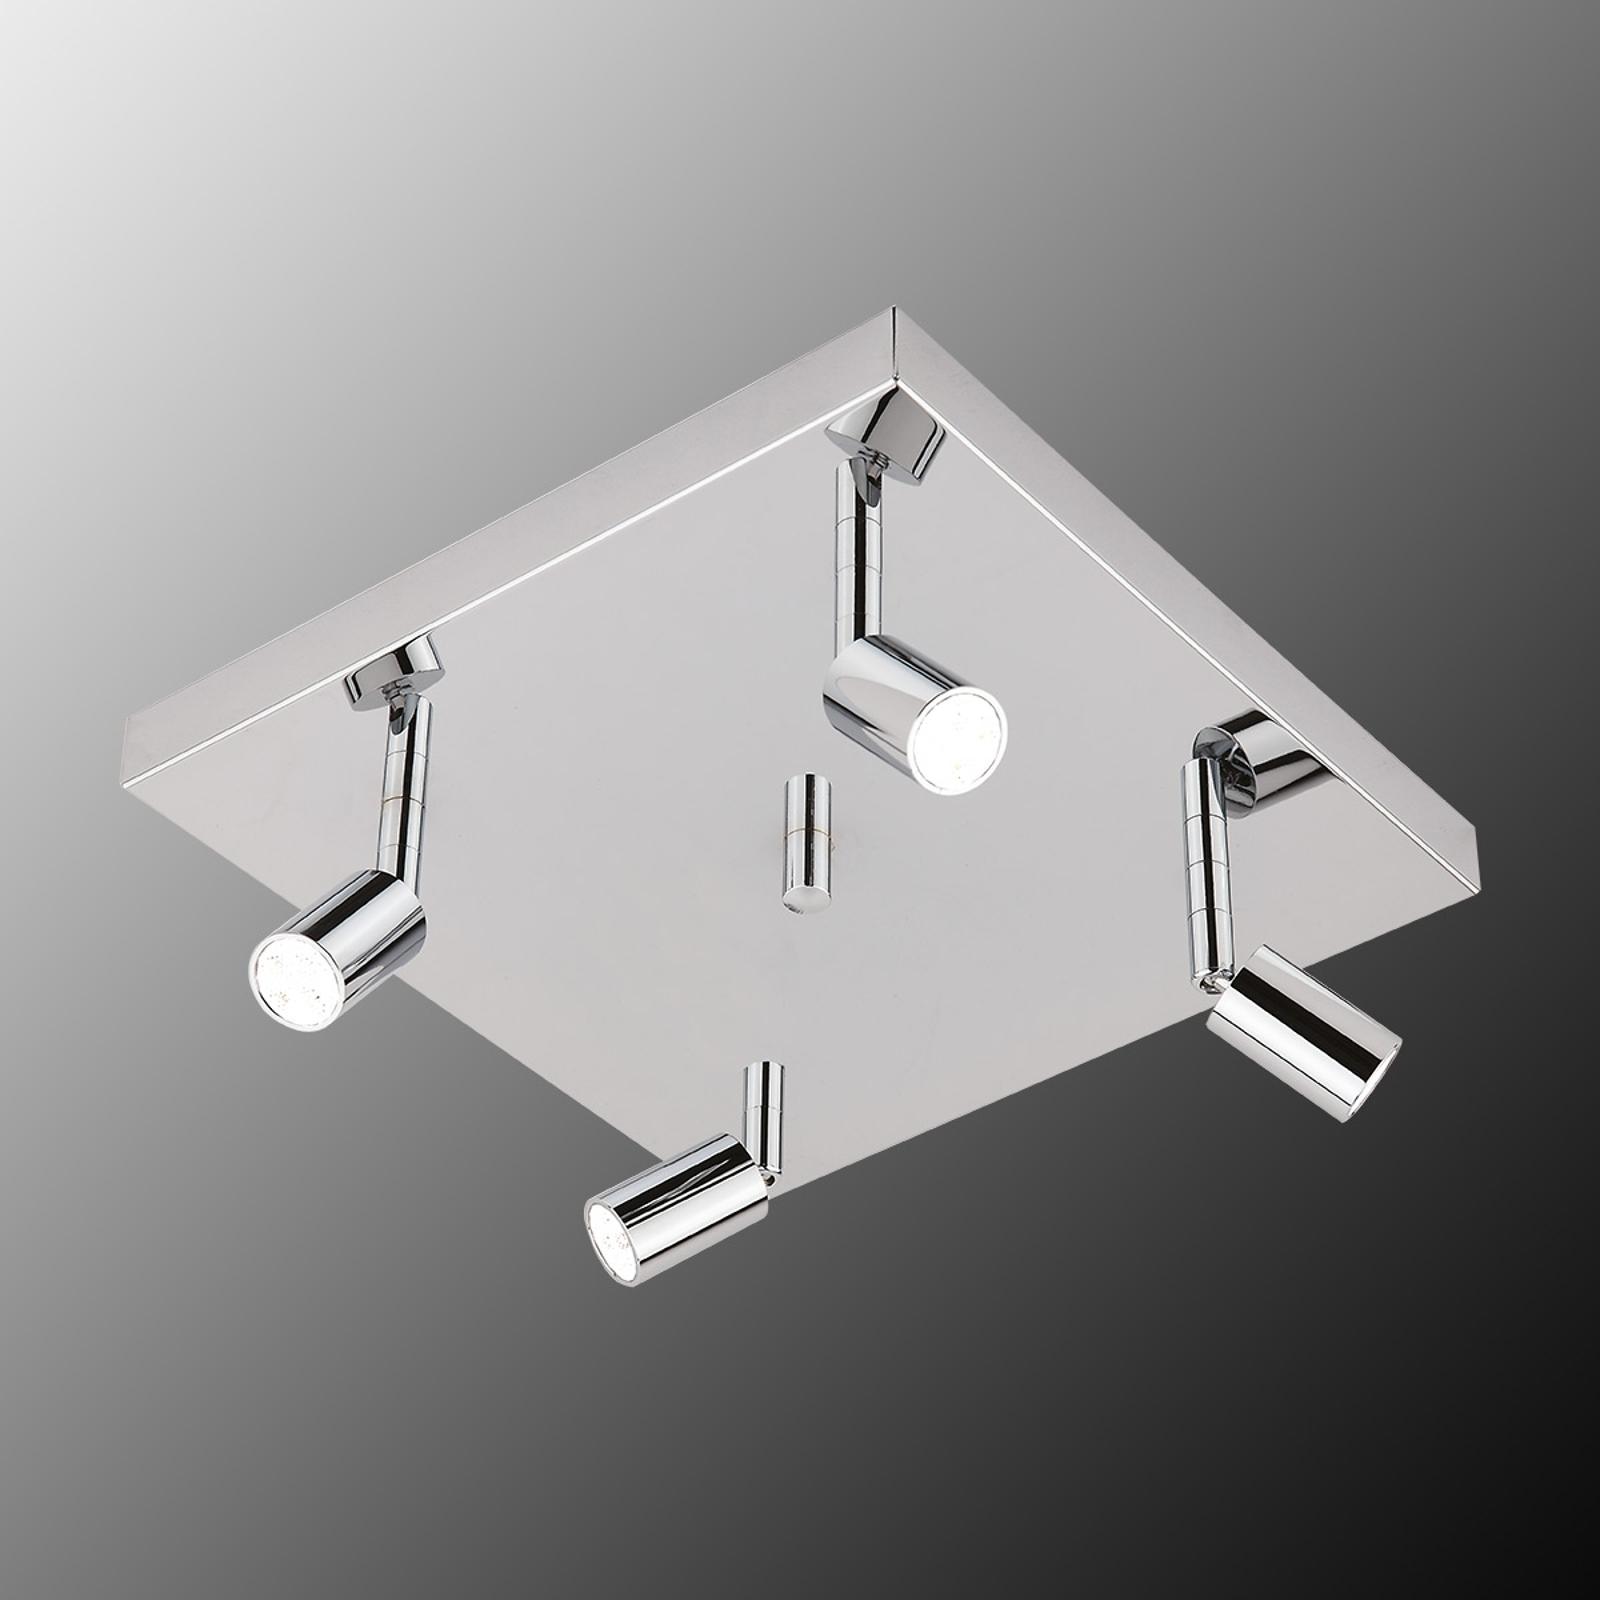 Kvadratisk LED-DL Karin med 4 ljuskällor